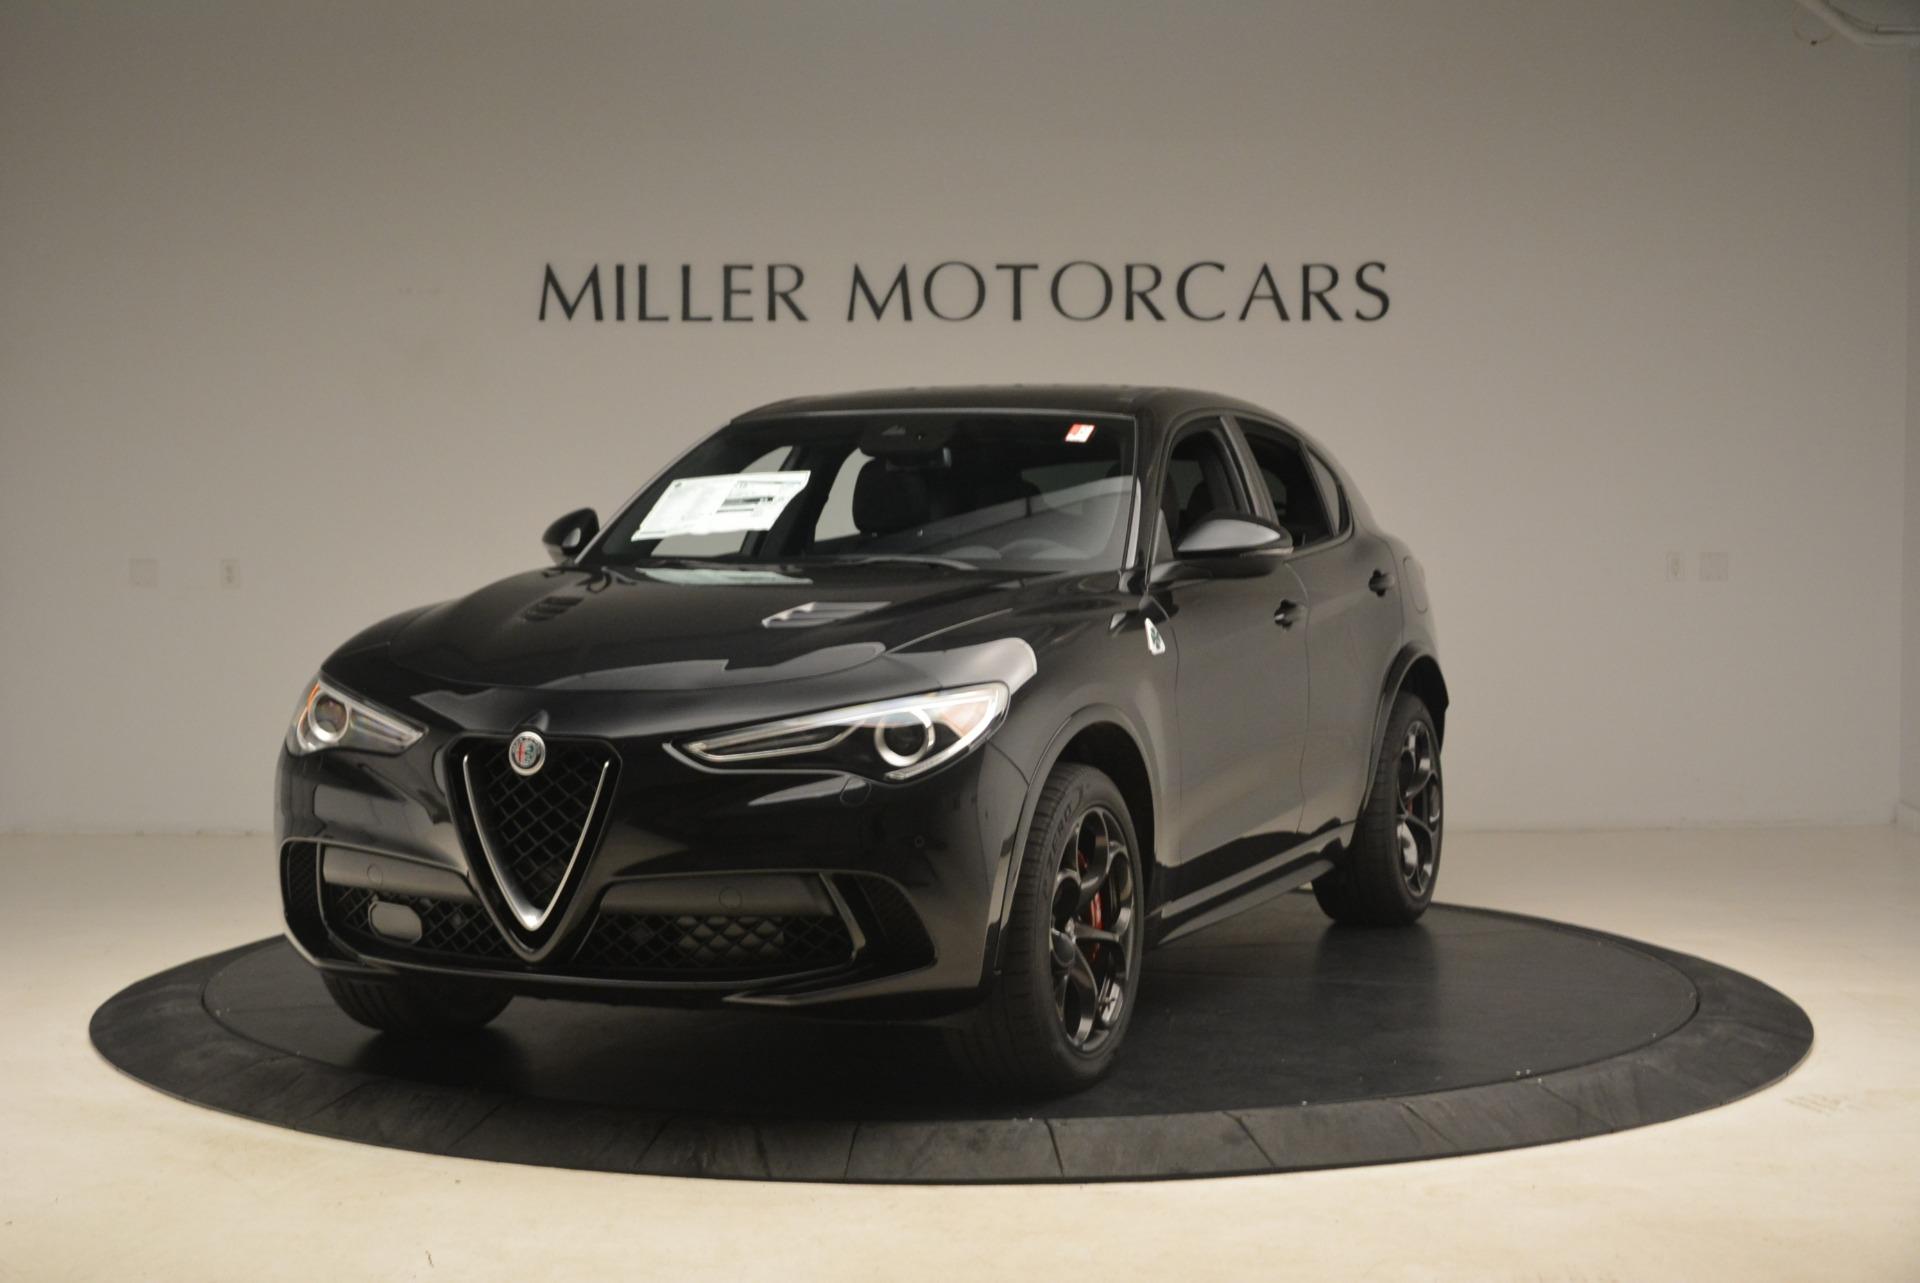 New 2019 Alfa Romeo Stelvio Quadrifoglio for sale $86,440 at Rolls-Royce Motor Cars Greenwich in Greenwich CT 06830 1